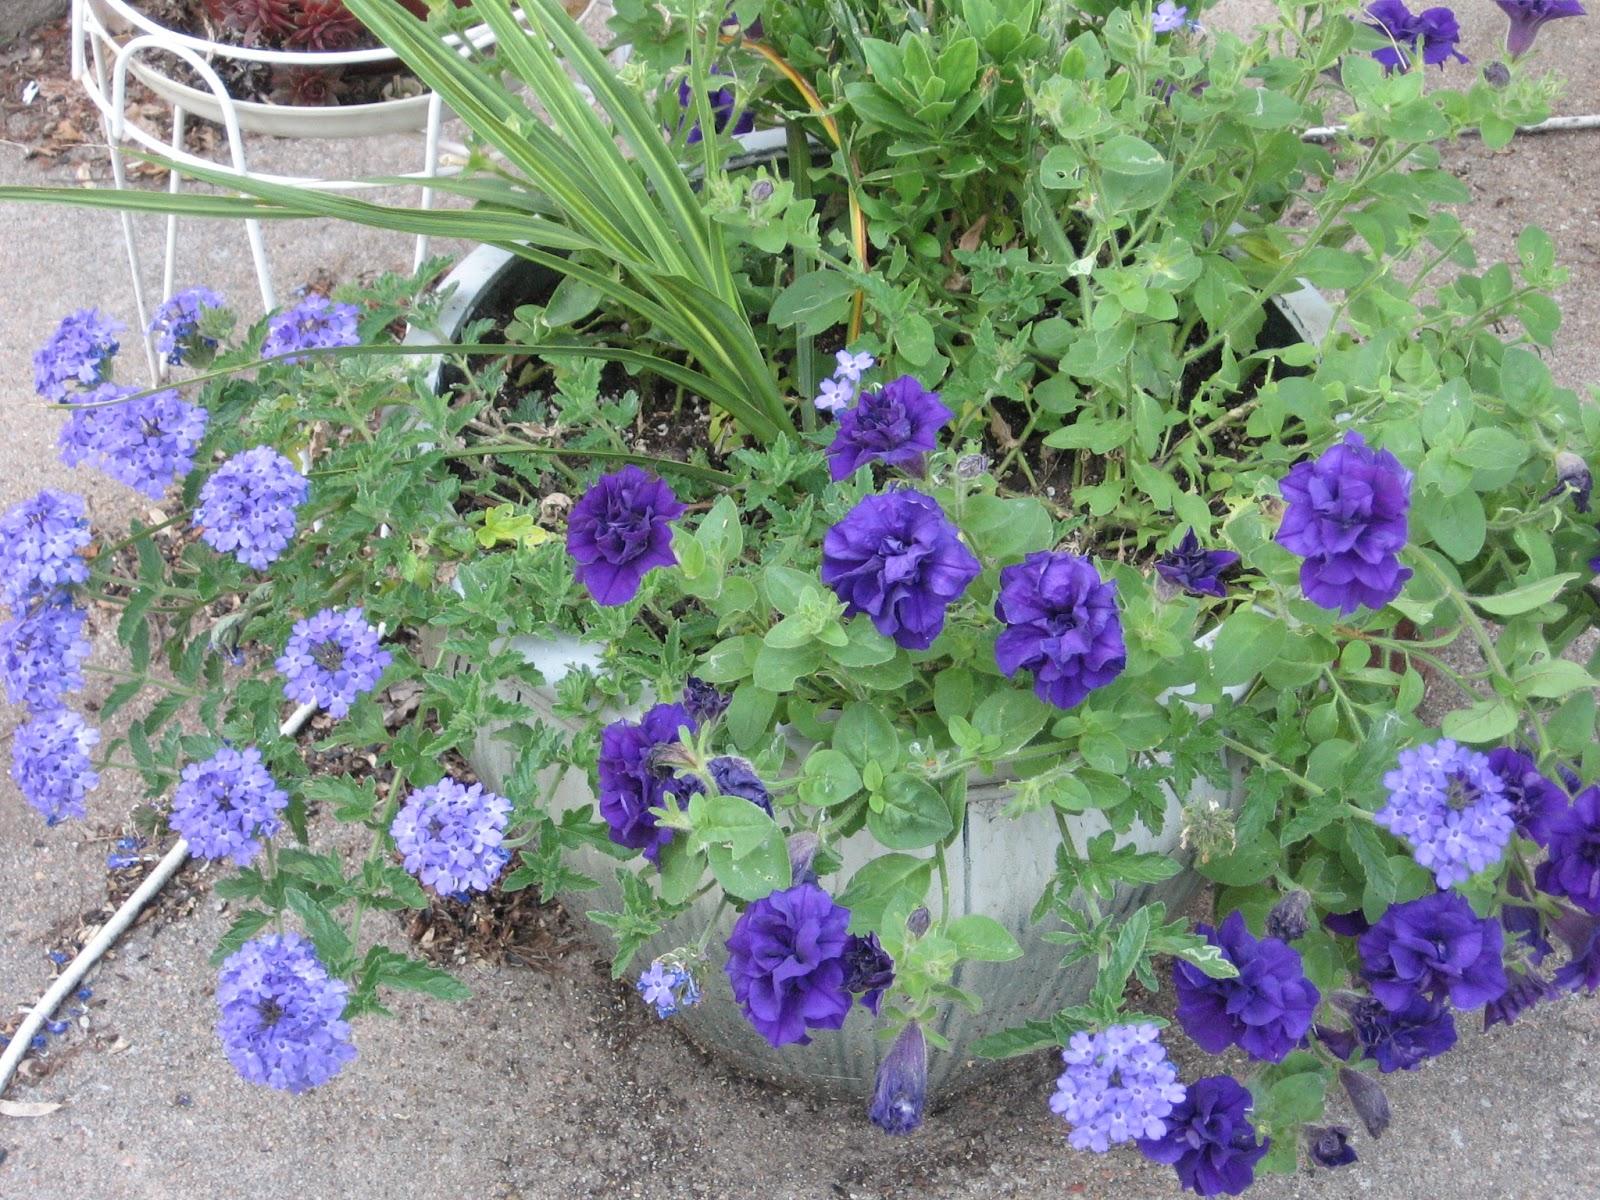 Kansas gardener container gardening pots and soil - Best soil for container gardening ...